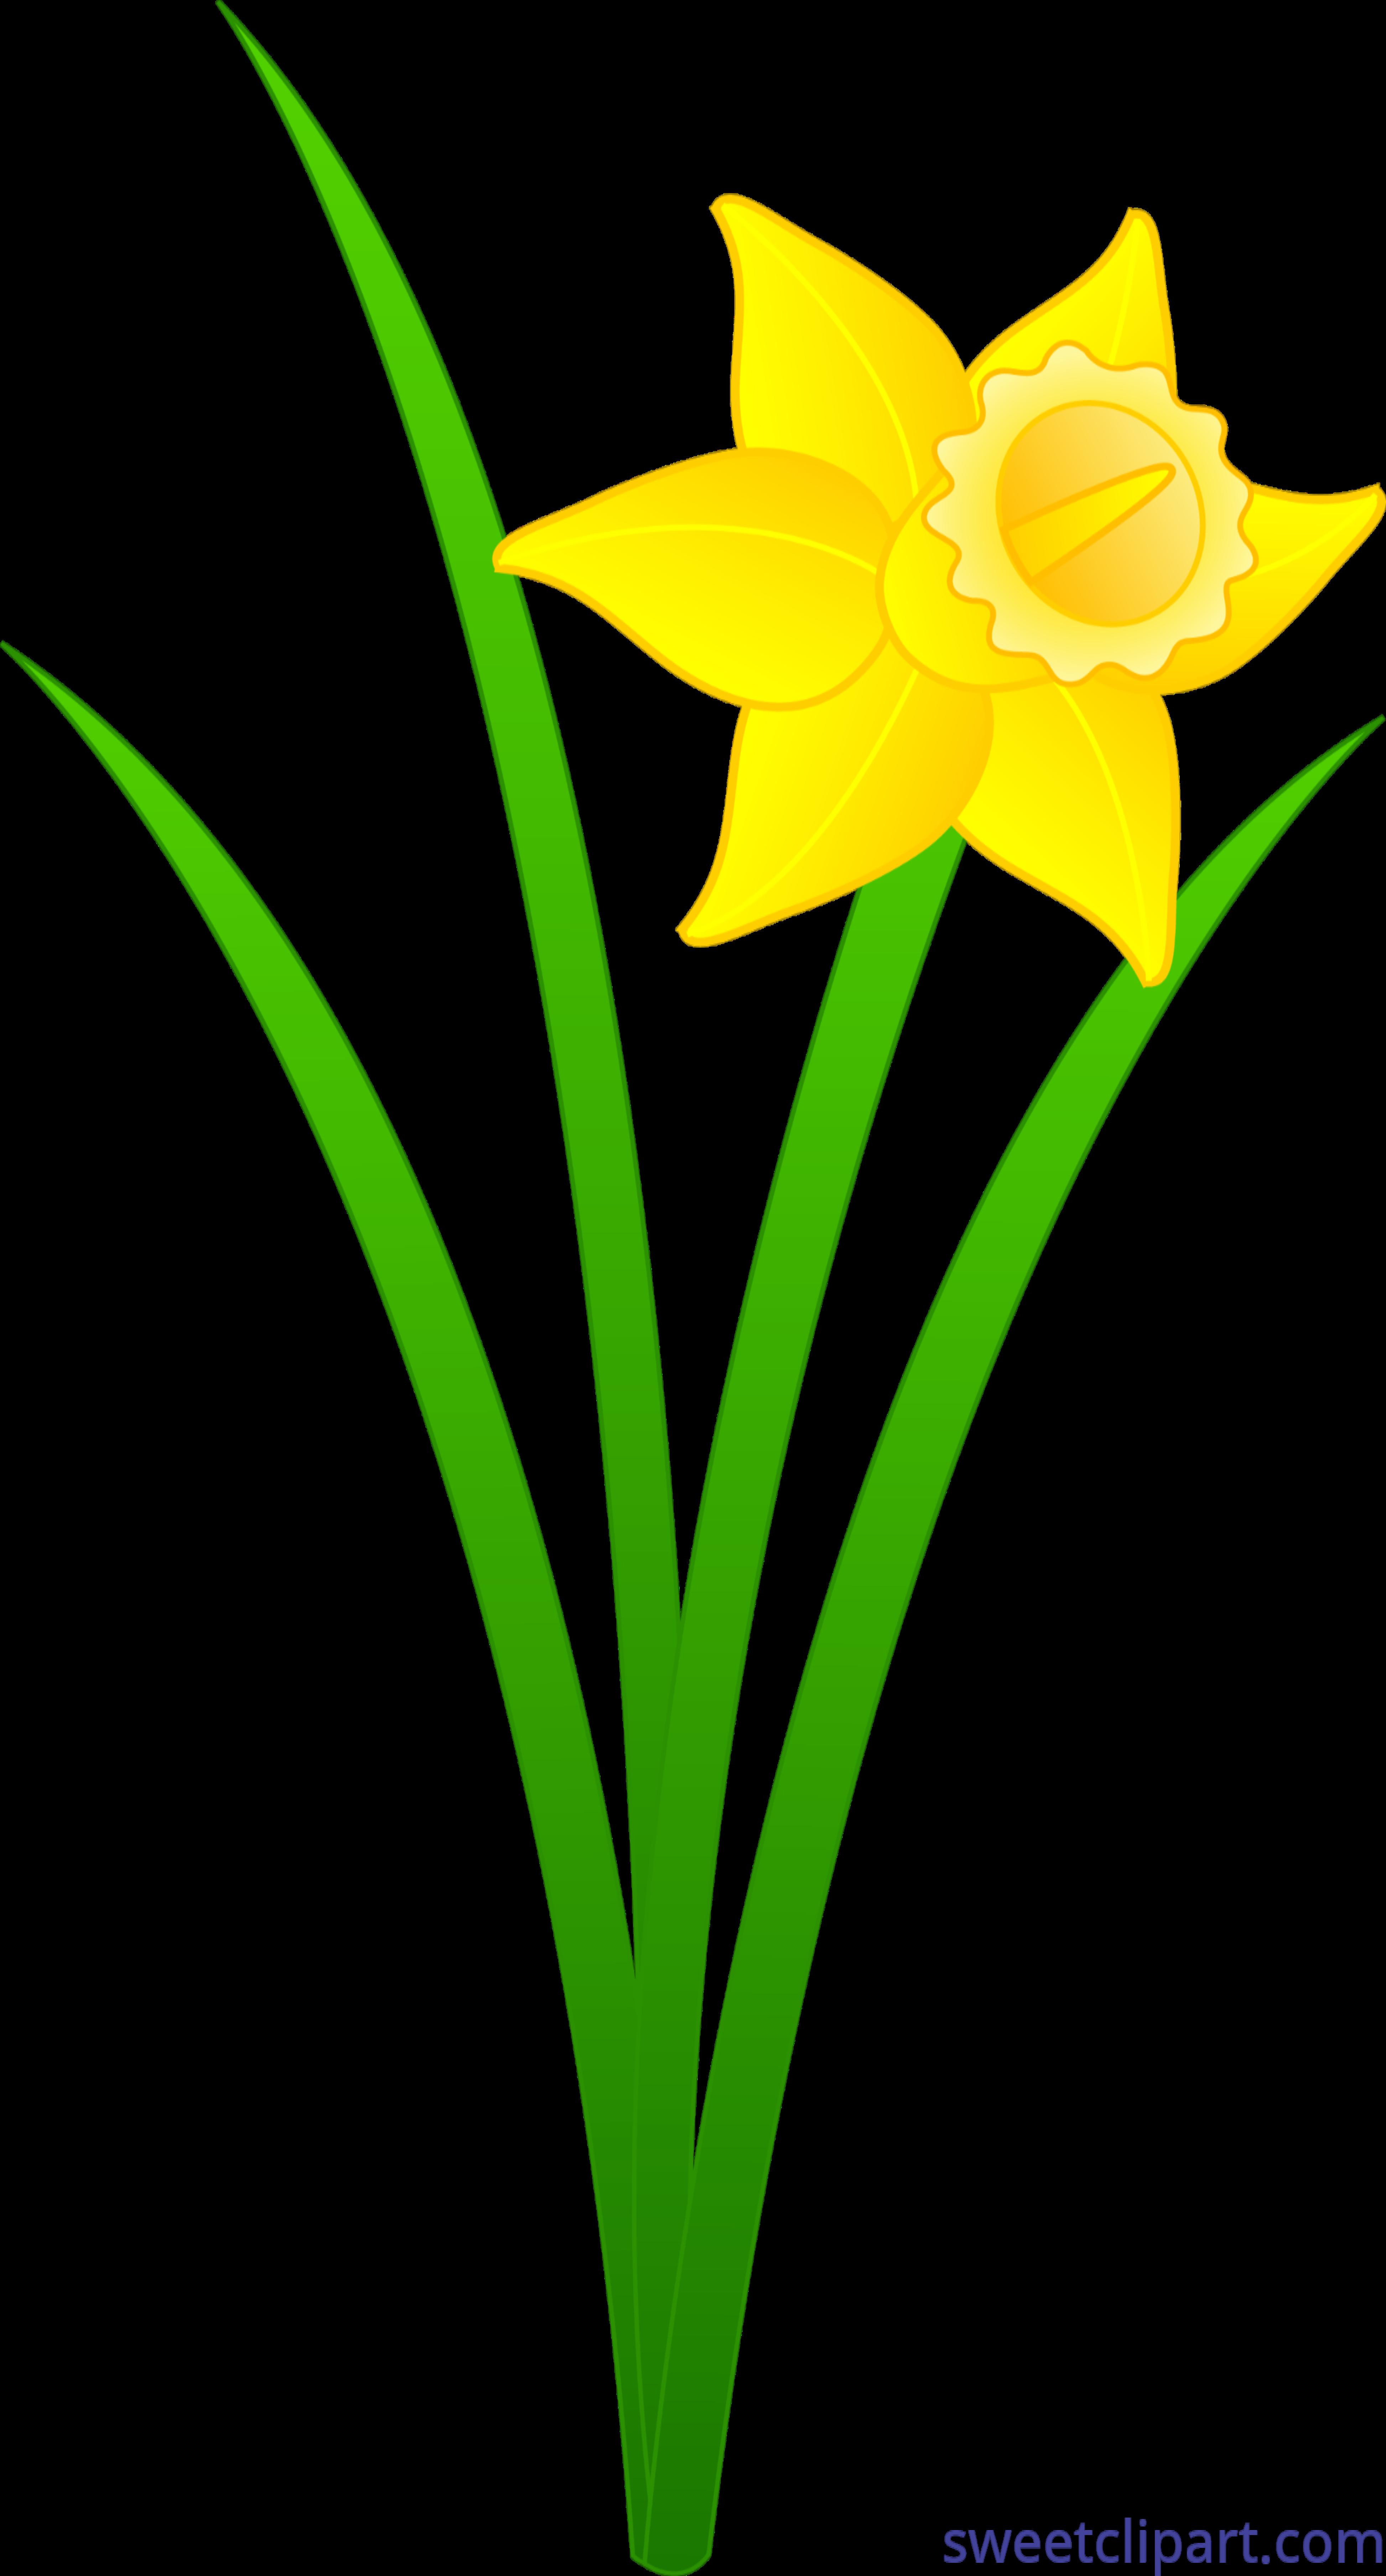 Golden clip art sweet. Clipart borders daffodil